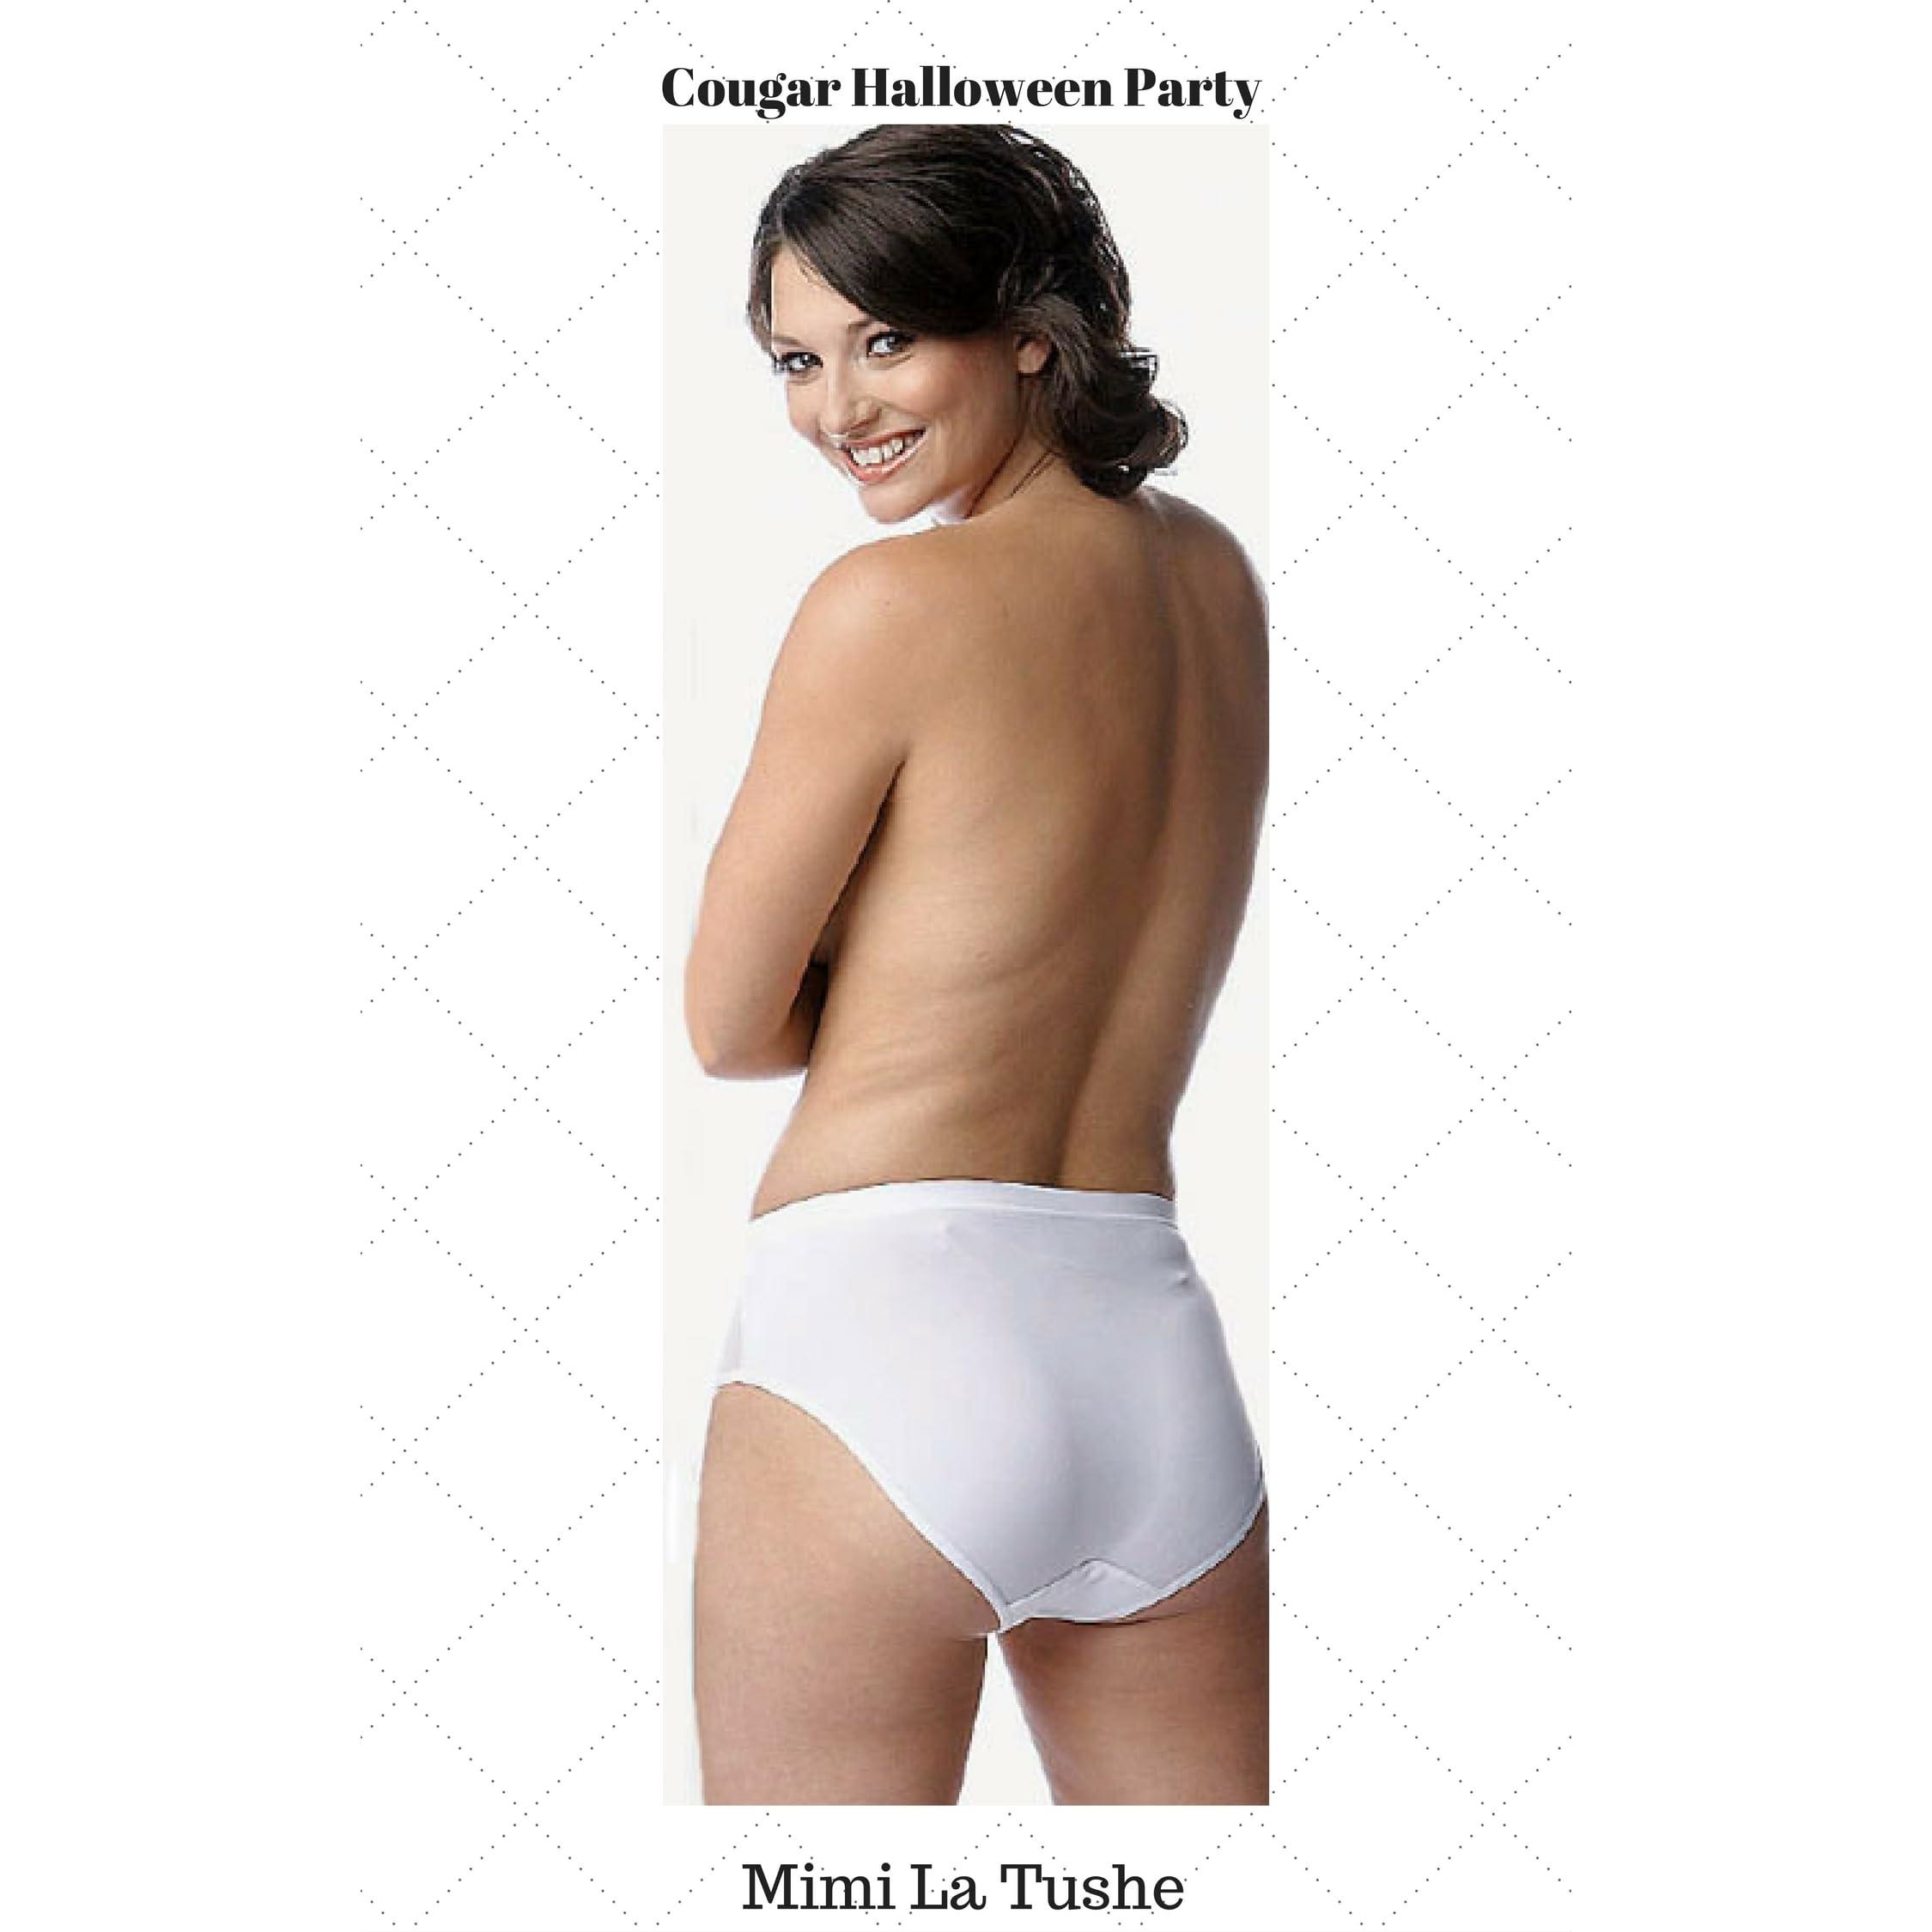 Cougar Halloween Party